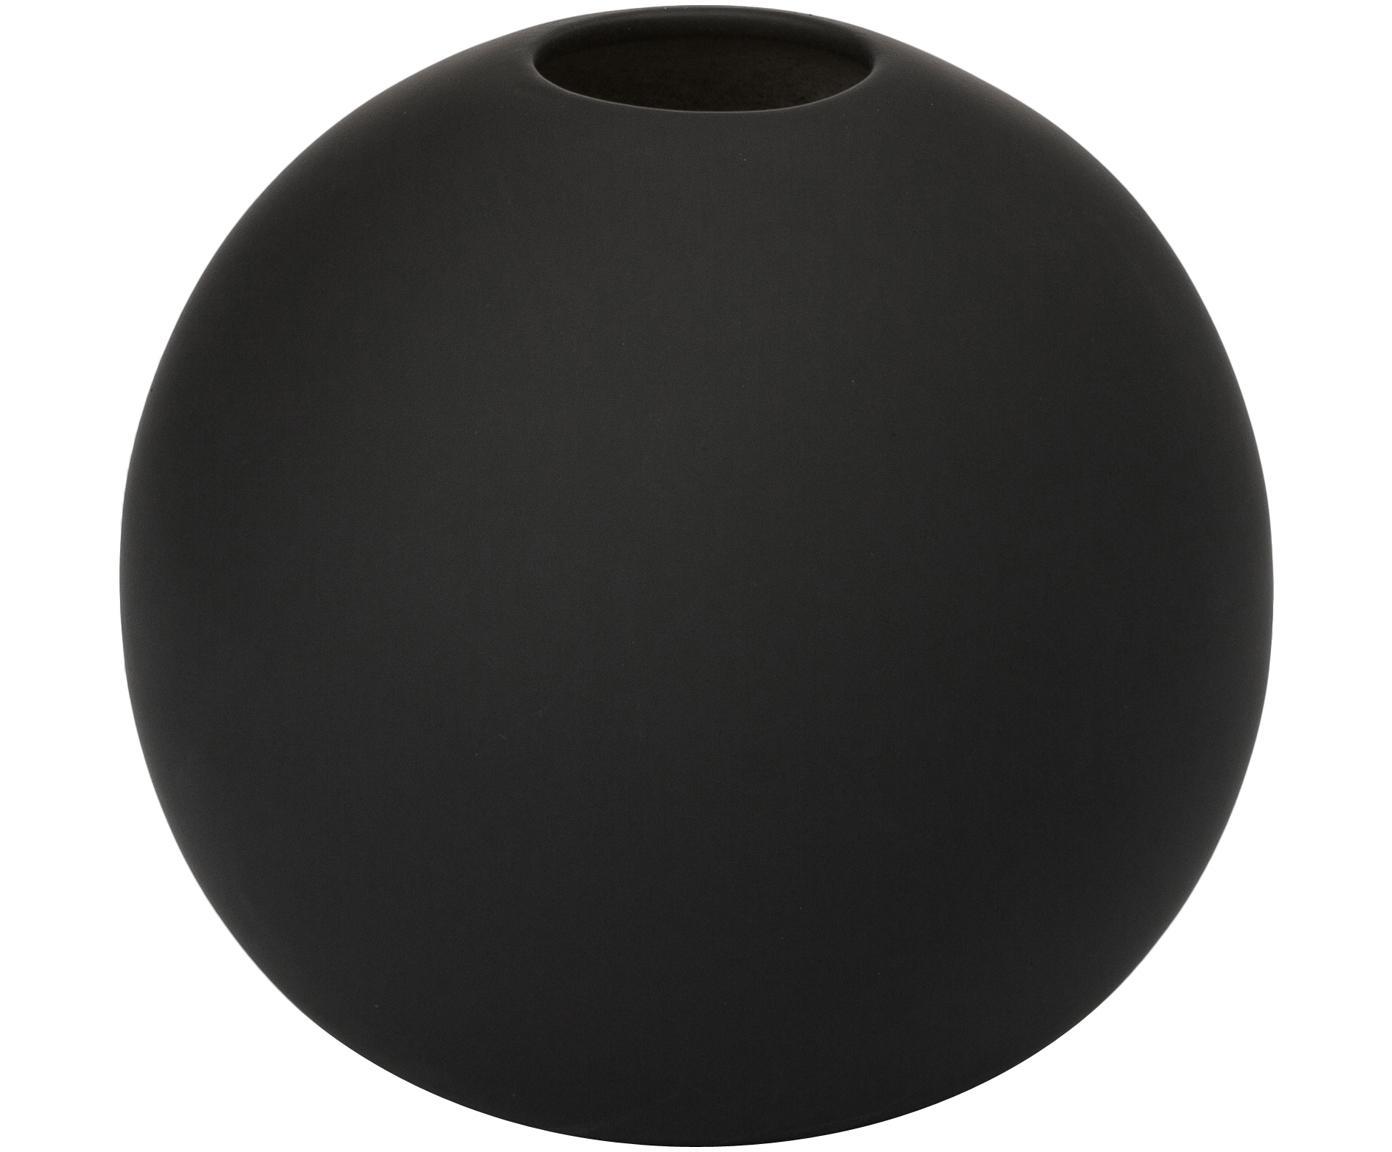 Vaas Ball, Keramiek, Zwart, Ø 10 x H 10 cm